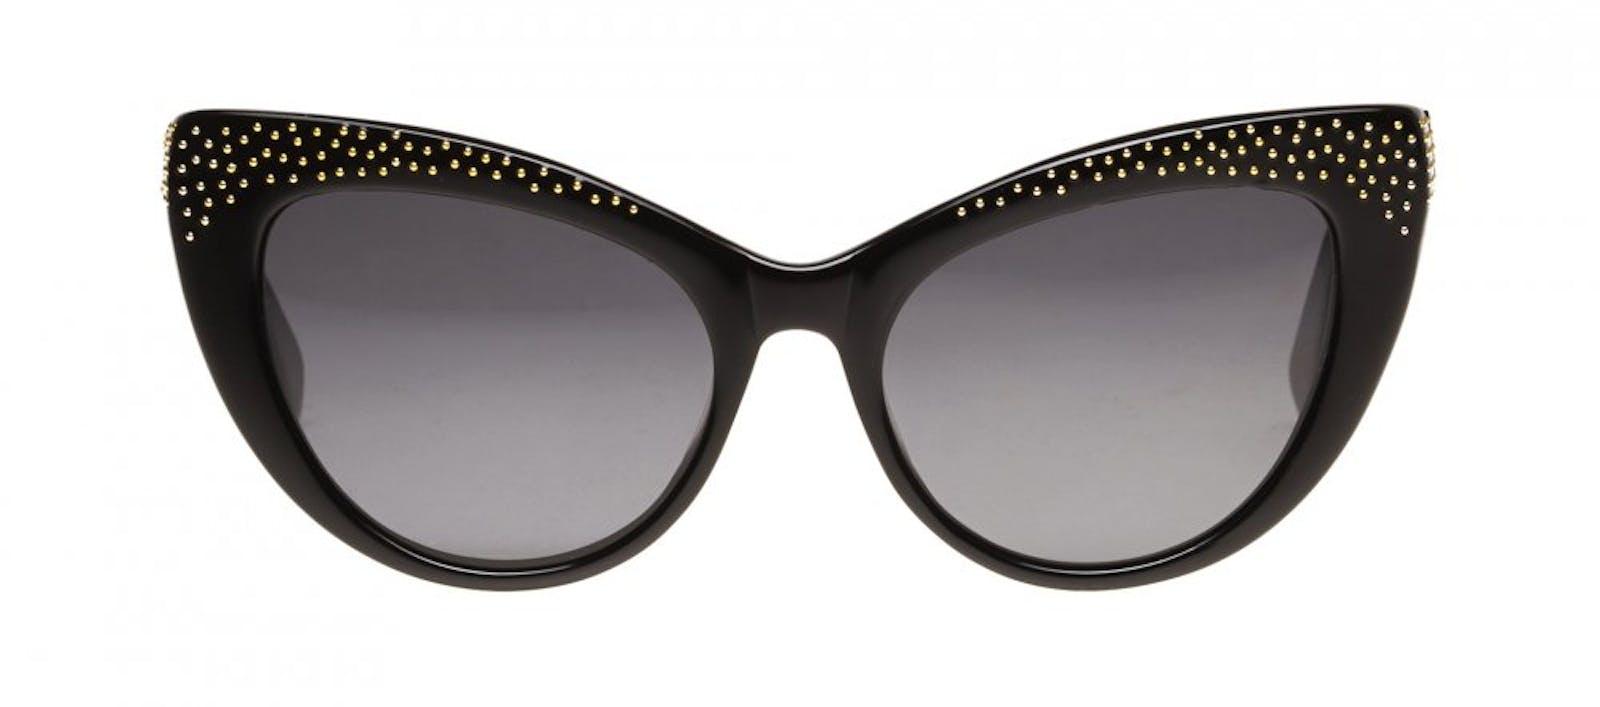 44653d7c25c Affordable Fashion Glasses Cat Eye Daring Cateye Sunglasses Women Keiko  Roxy Noir Front